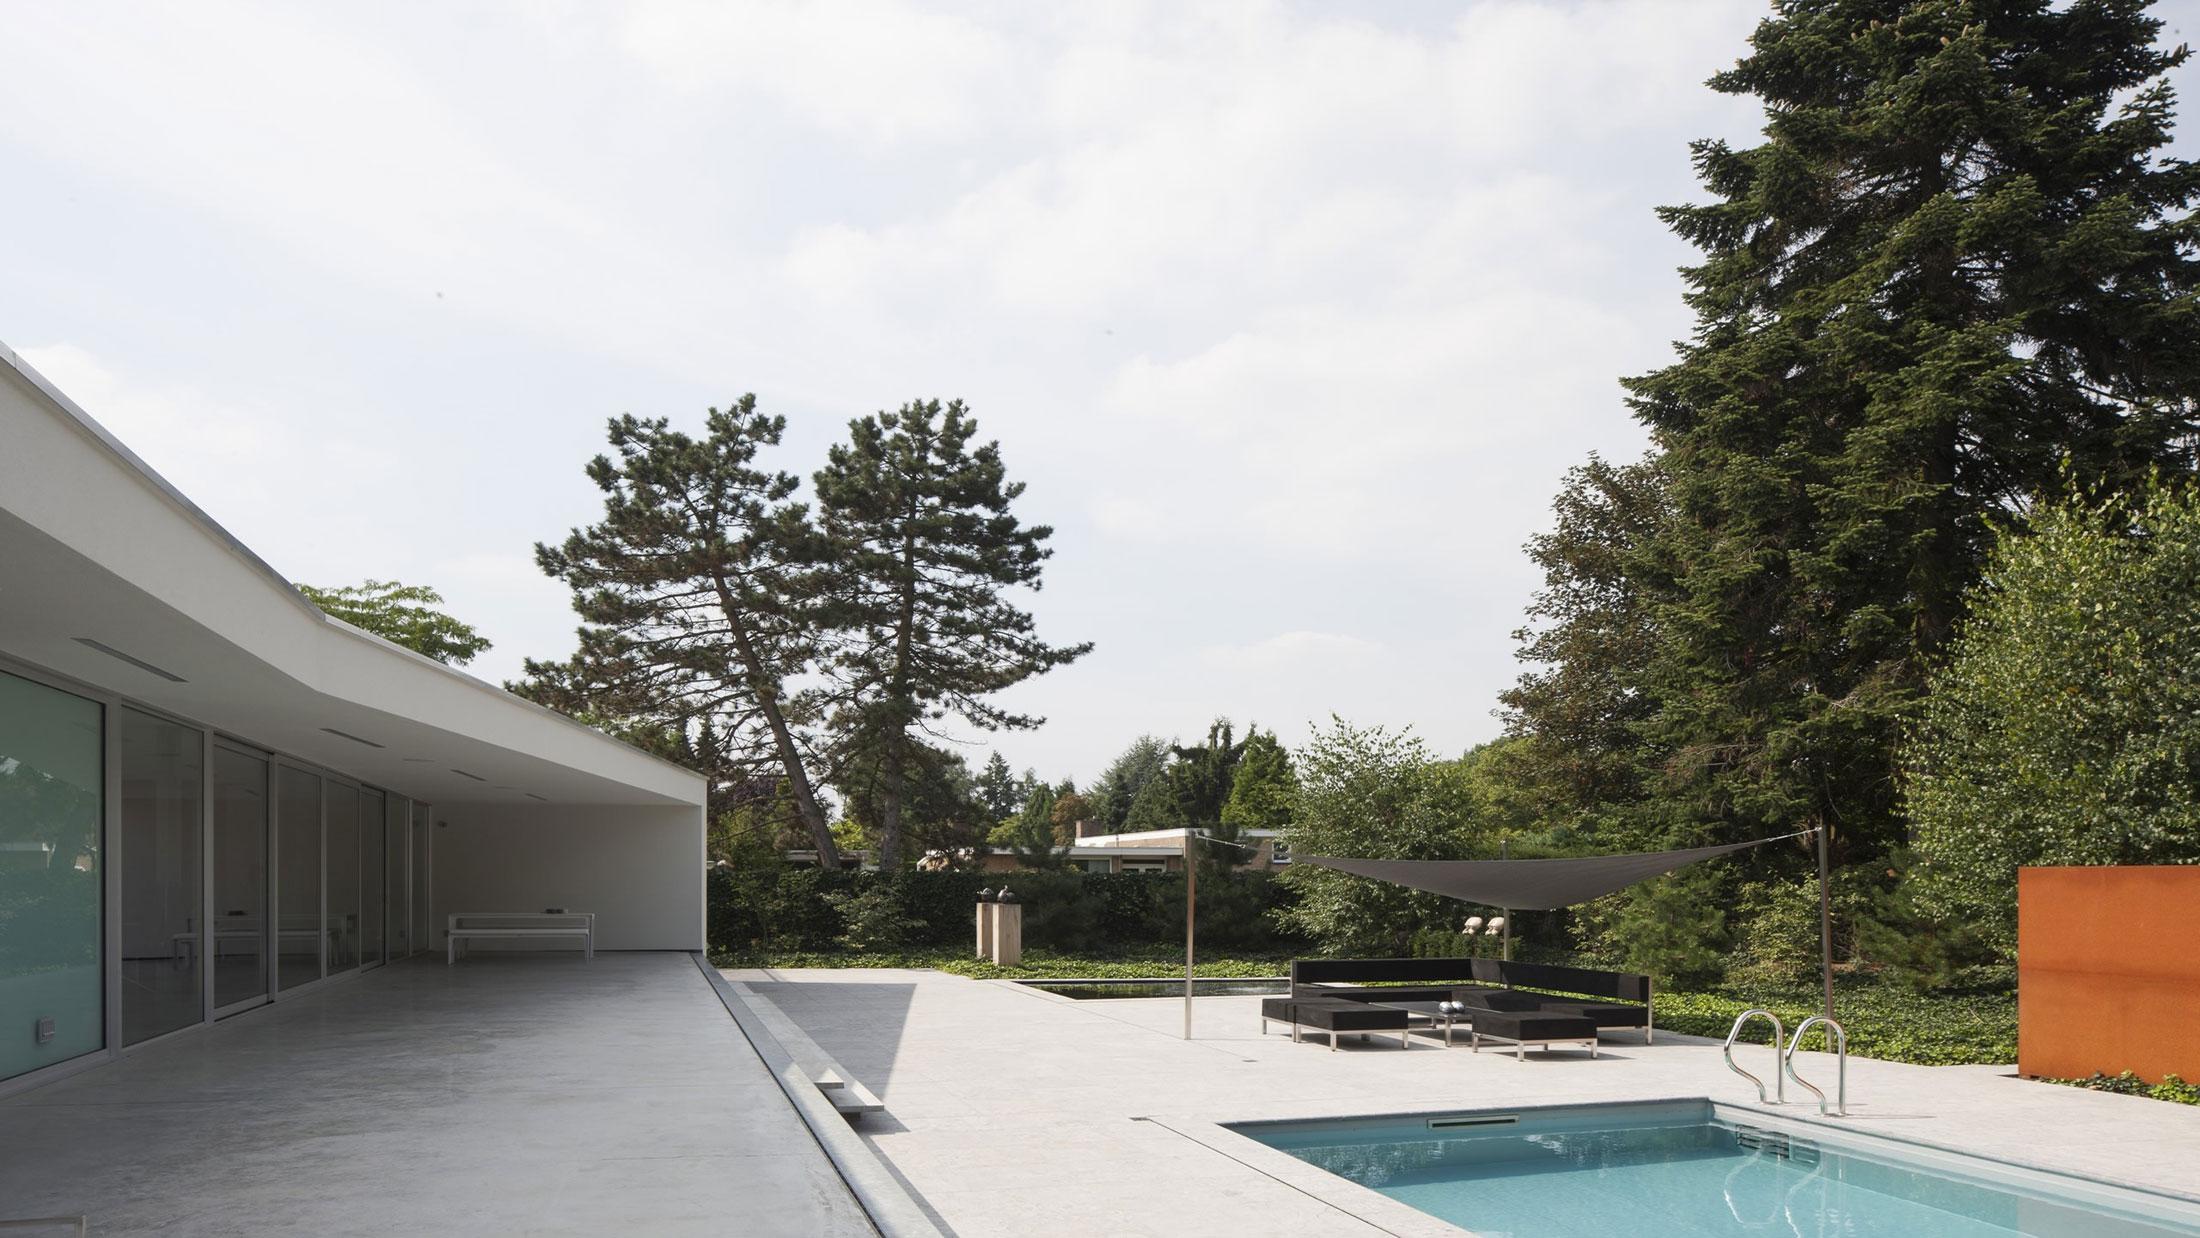 Boxed Villa Spee Haelen with Panoramic Windows by Lab32 architecten-12